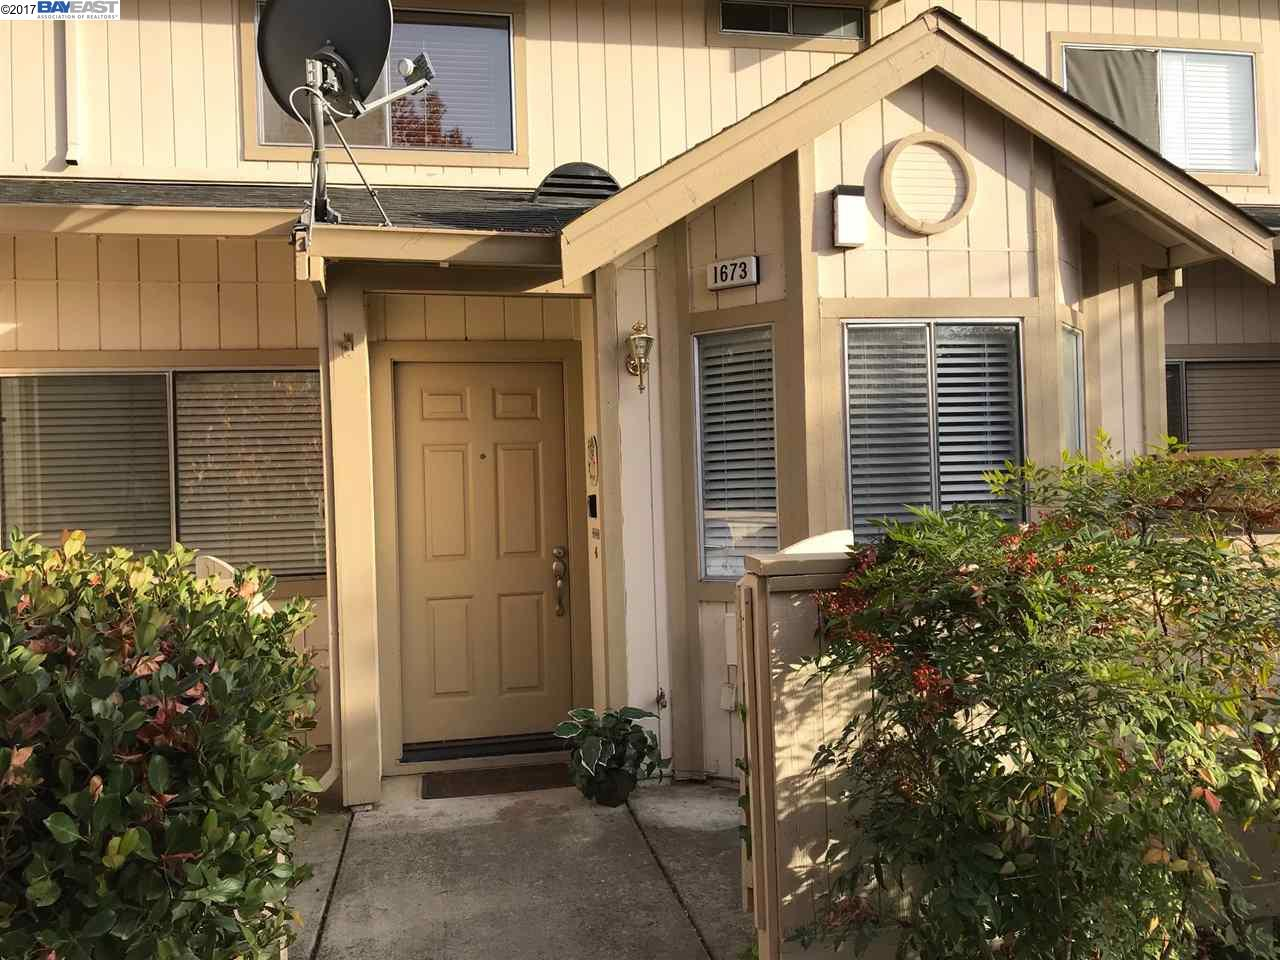 Townhouse for Sale at 1673 Paseo Laguna Seco 1673 Paseo Laguna Seco Livermore, California 94551 United States